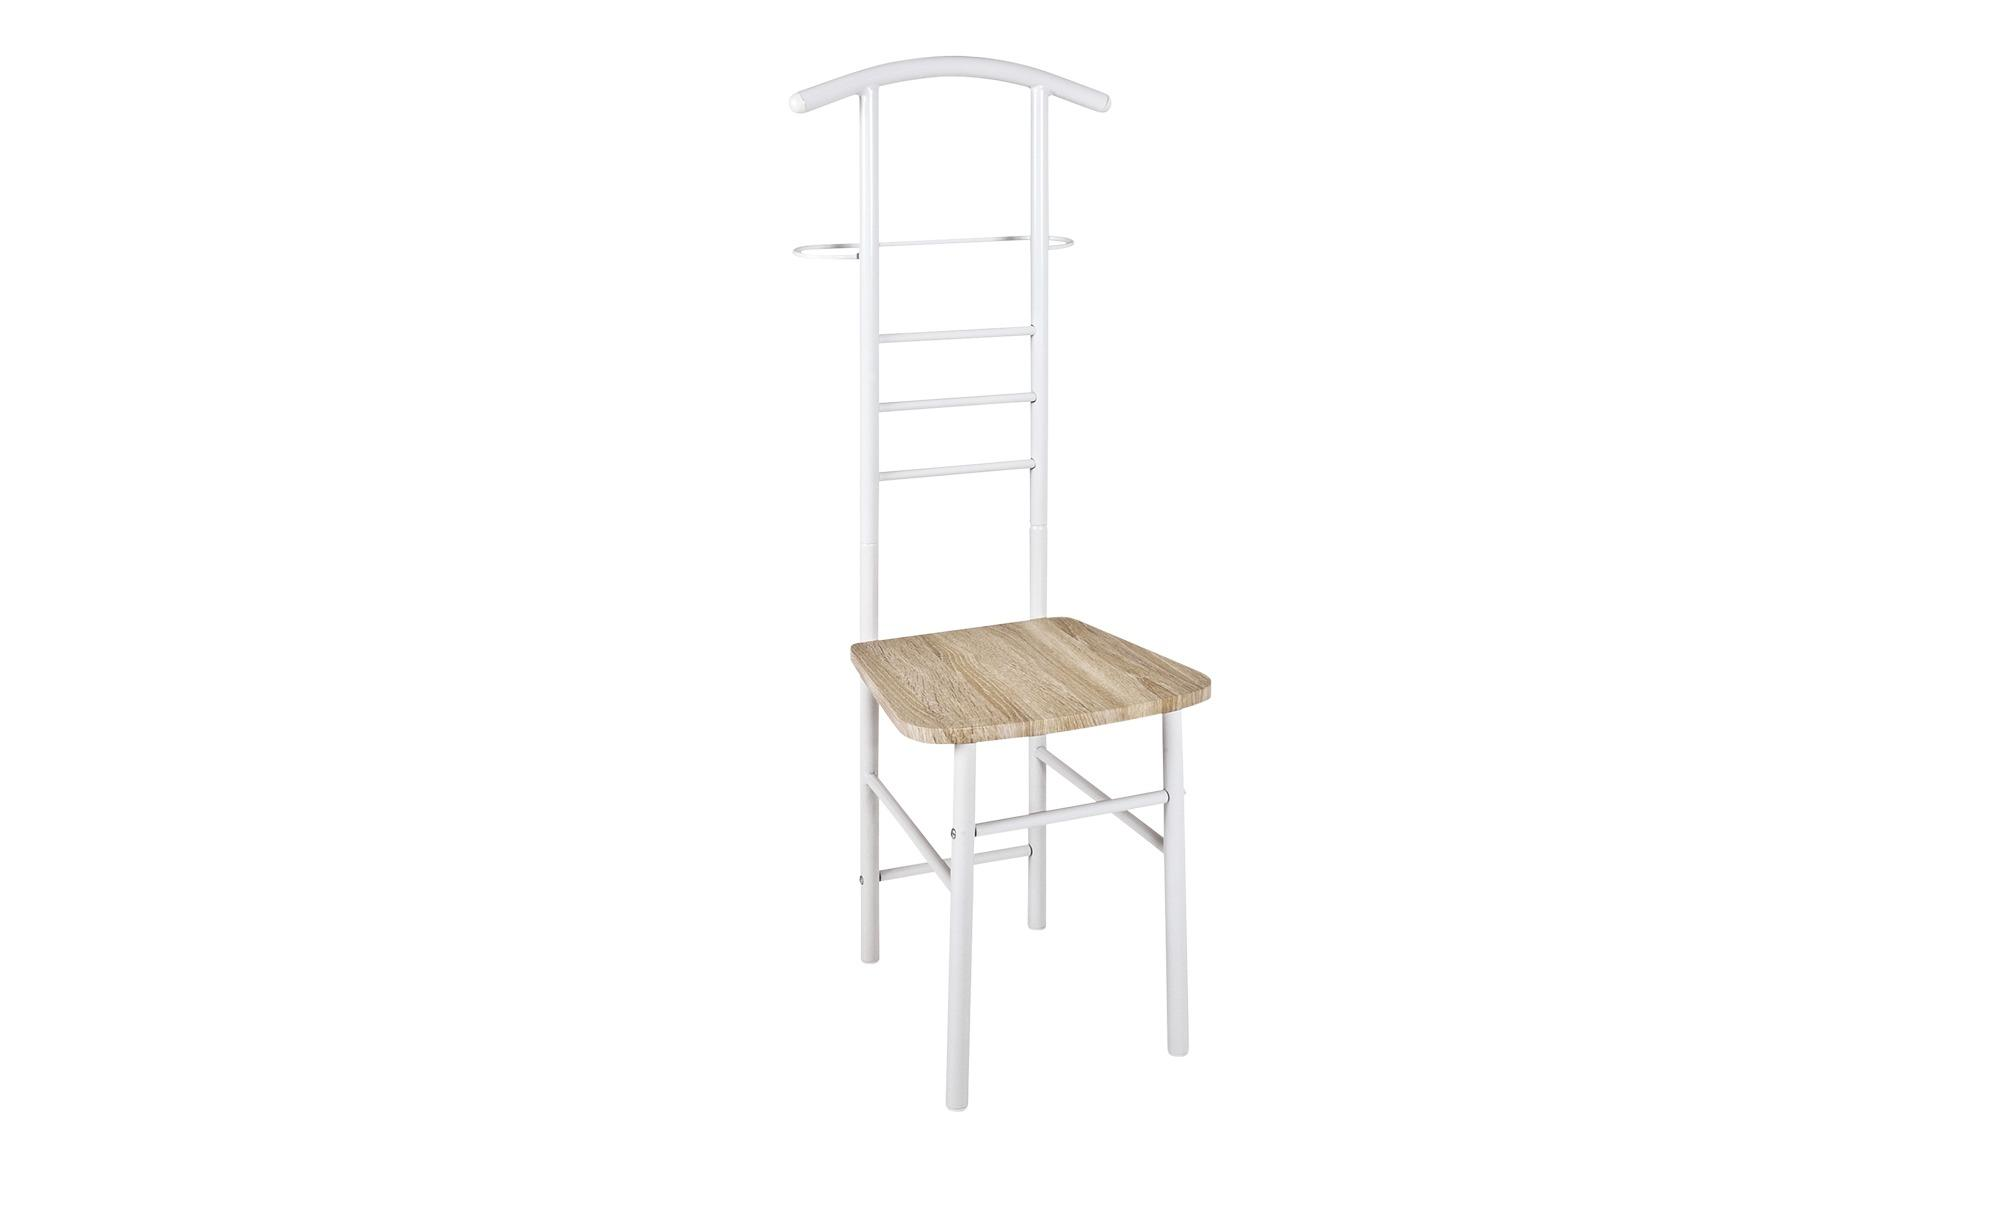 Herrendienerstuhl - weiß - Stahl - Möbel Kraft